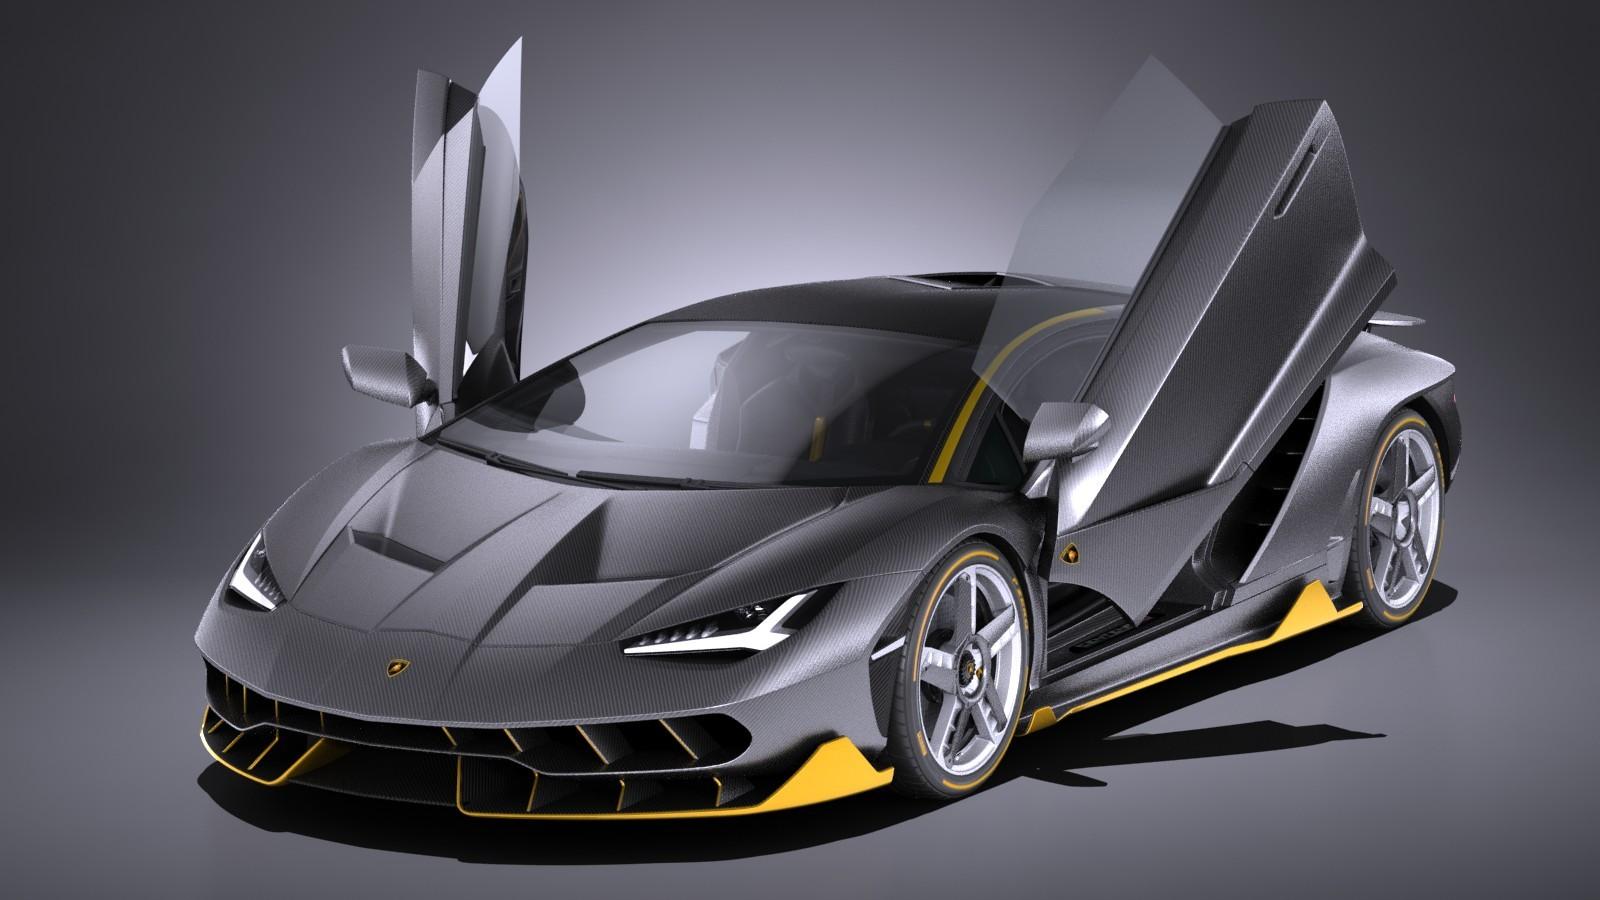 3d Library Wallpaper 2016 Lamborghini Centenario Magellan Jets